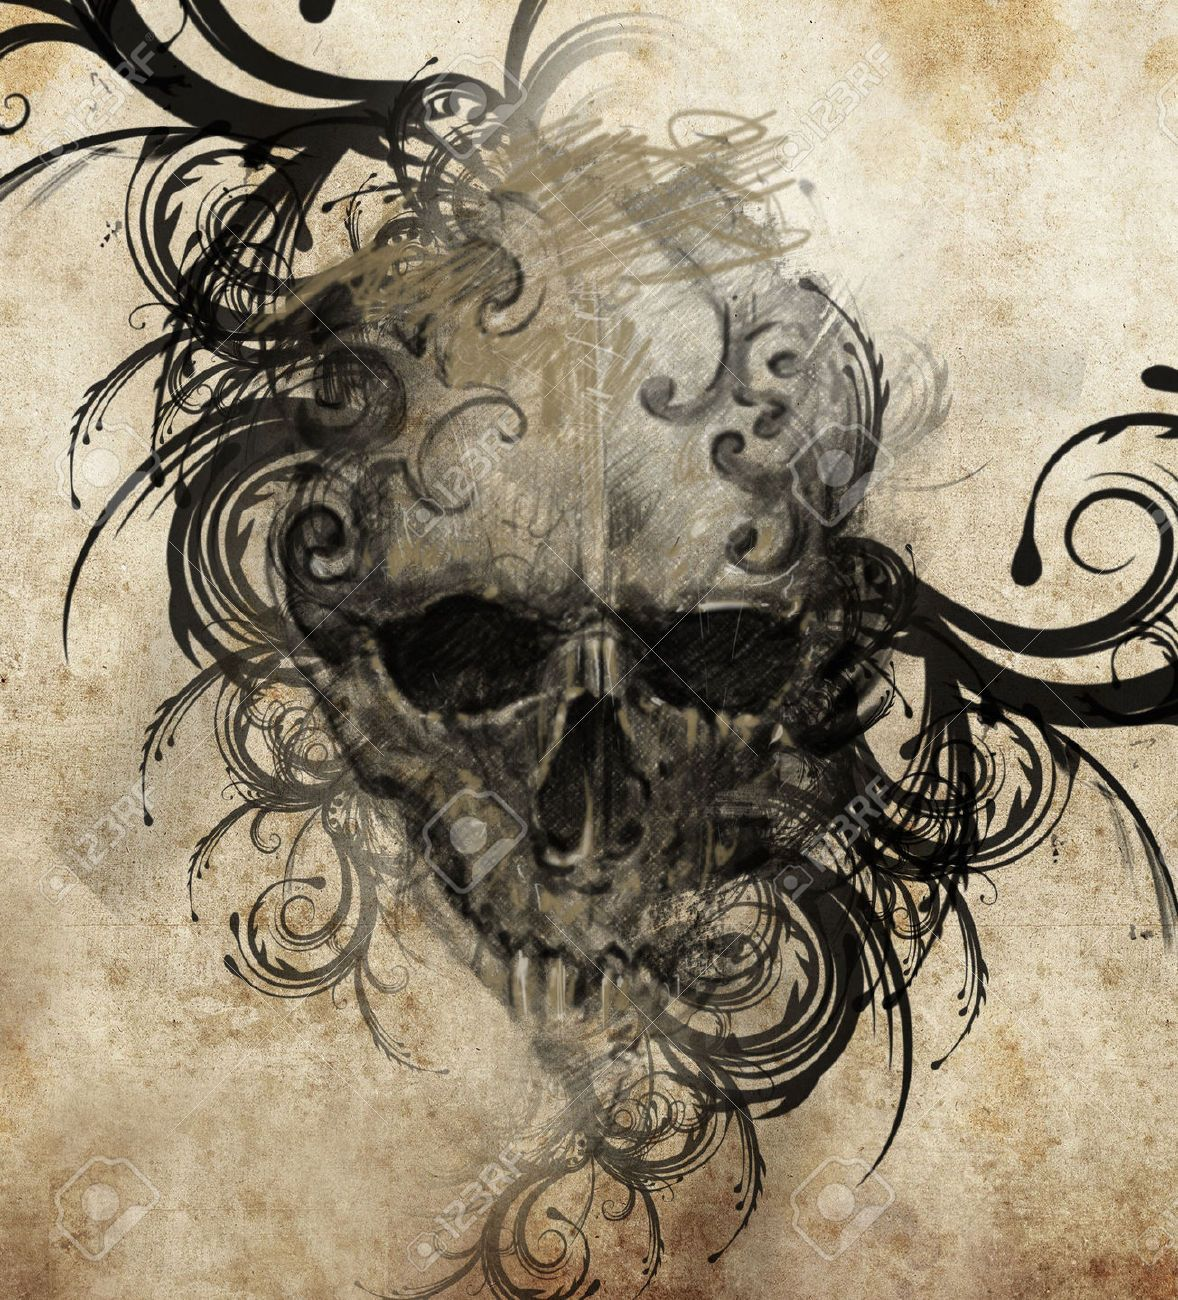 motif tatouage tour de bras pine recherche google skulls pinterest totenk pfe. Black Bedroom Furniture Sets. Home Design Ideas